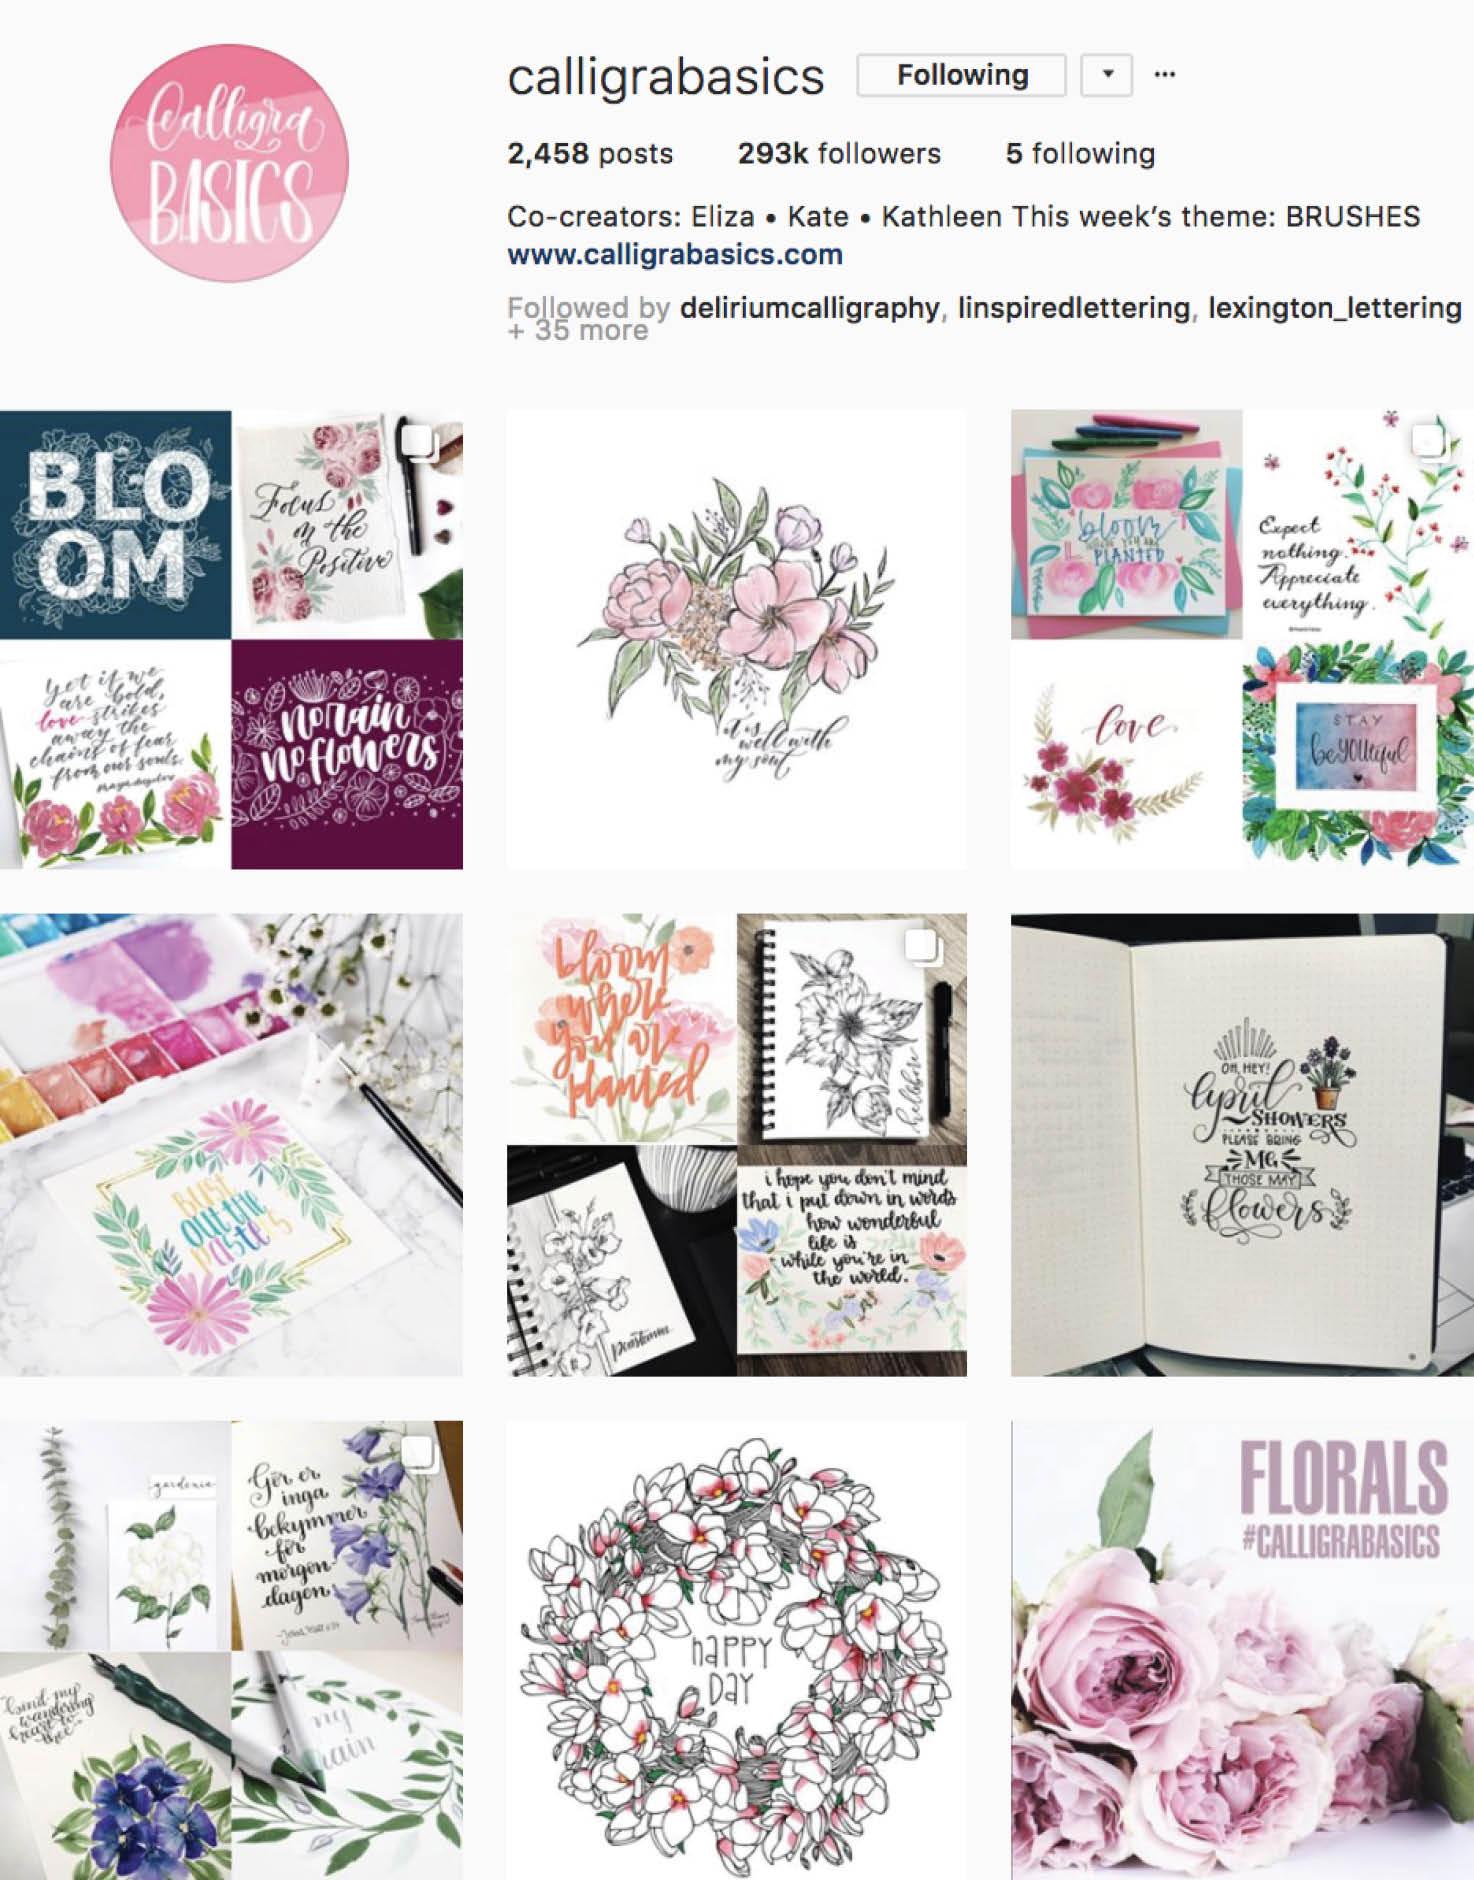 Calligraphy Social Media Inspiration: Calligrabasics IG